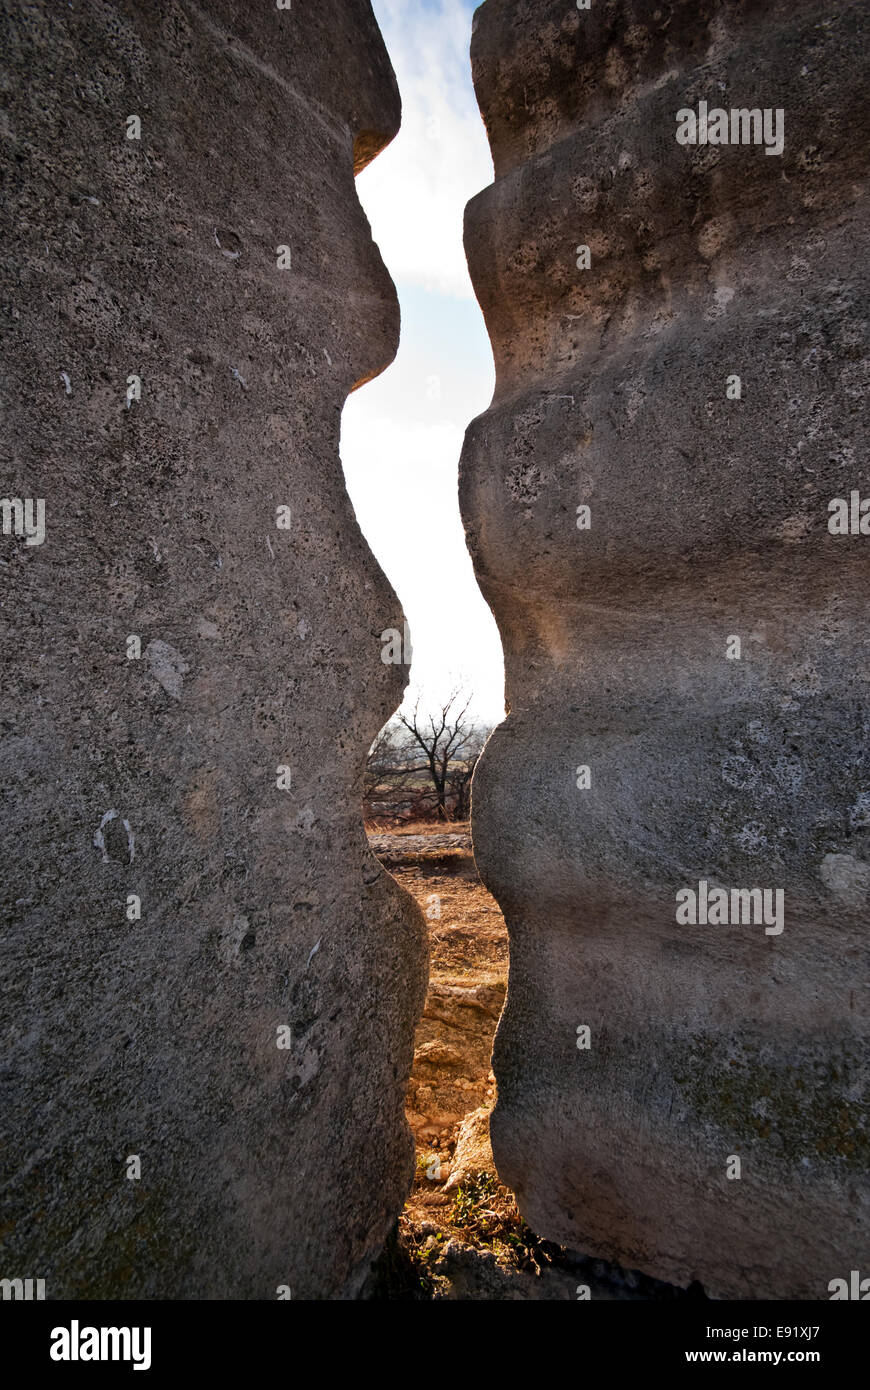 stone plastics - Stock Image